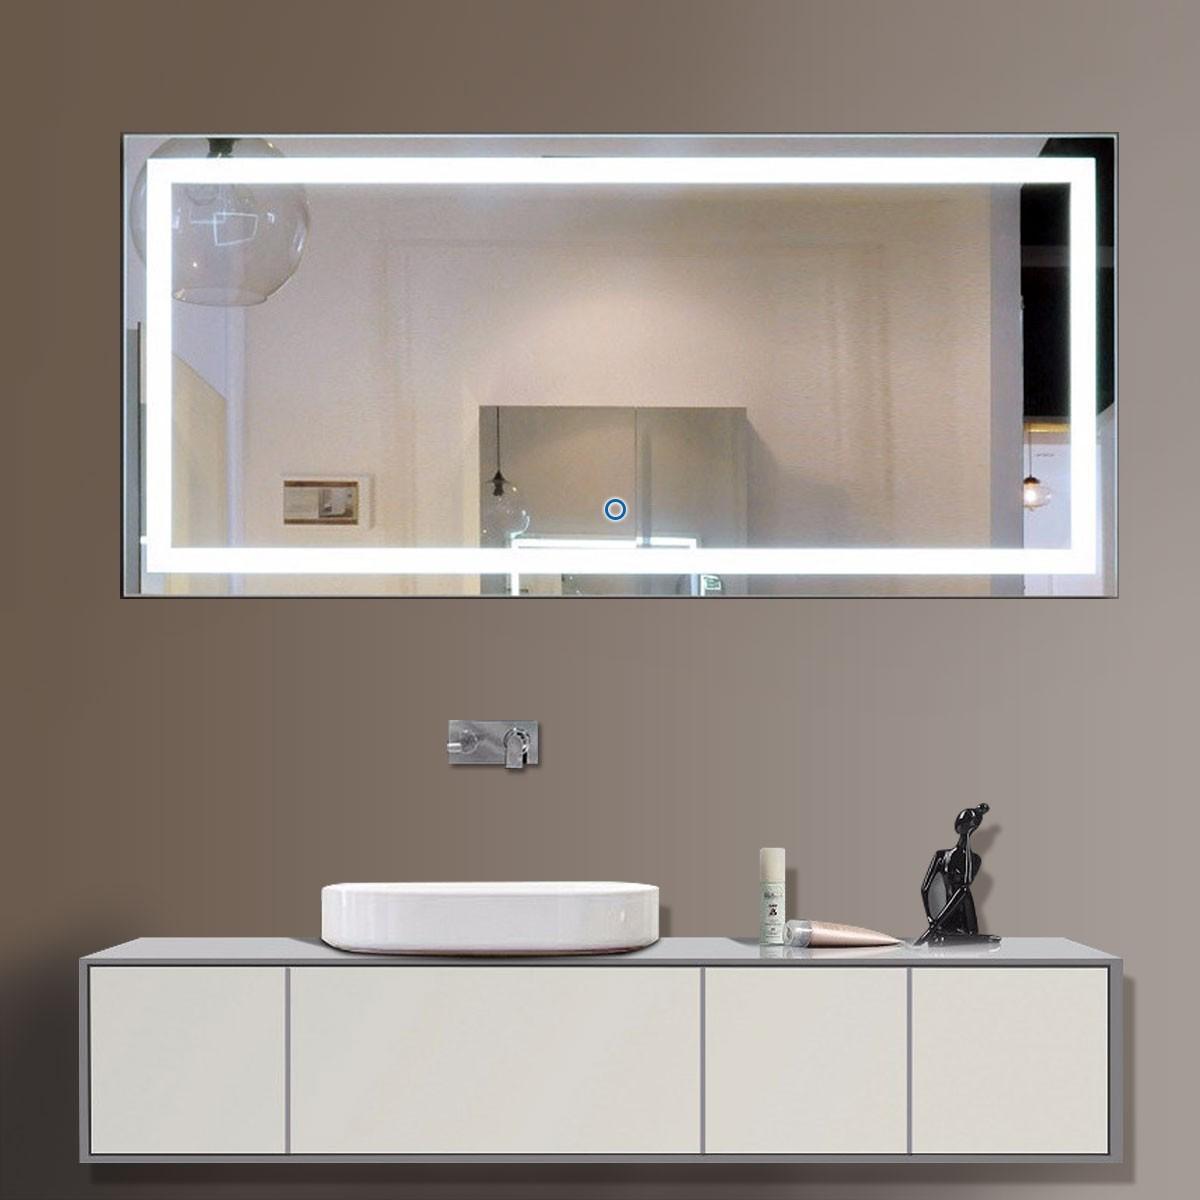 60 x 28 po miroir led salle de bain horizontal avec l for Miroir salle de bain 90 x 60